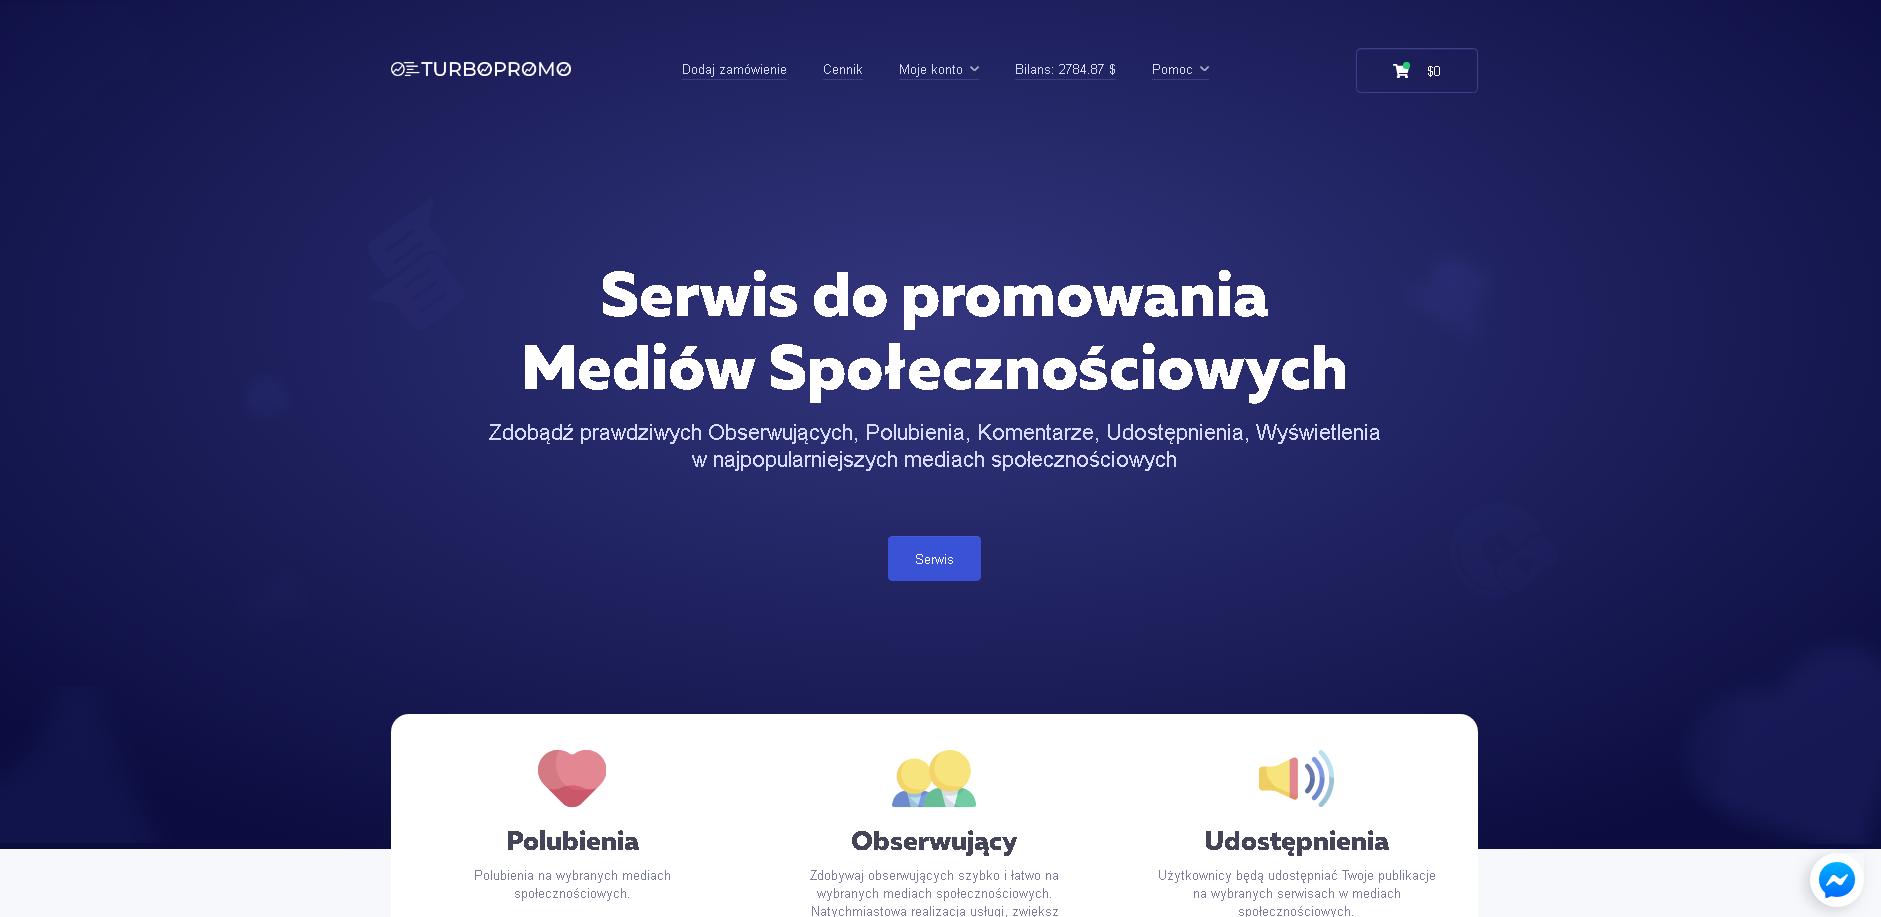 Turbopromo.pl